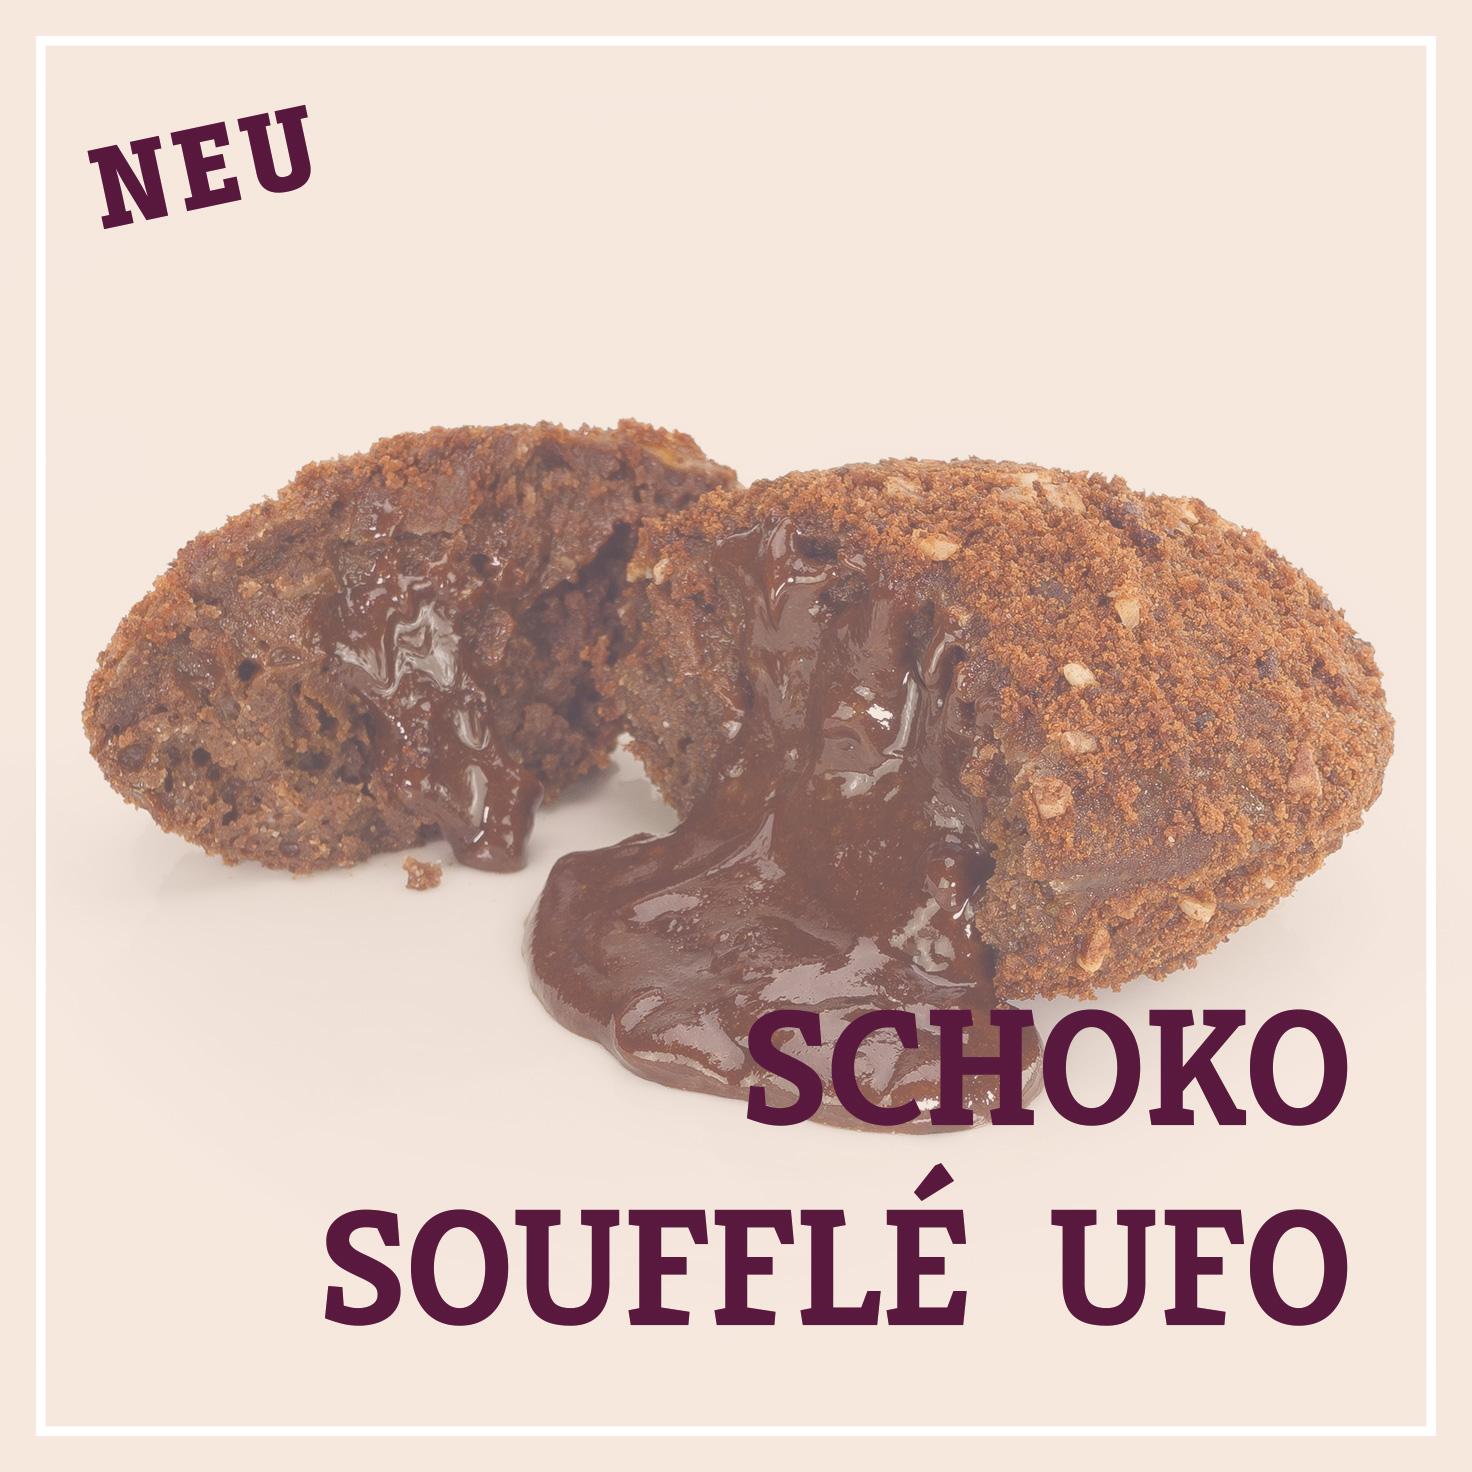 Heiss & Süß - Schokosoufflé Ufo